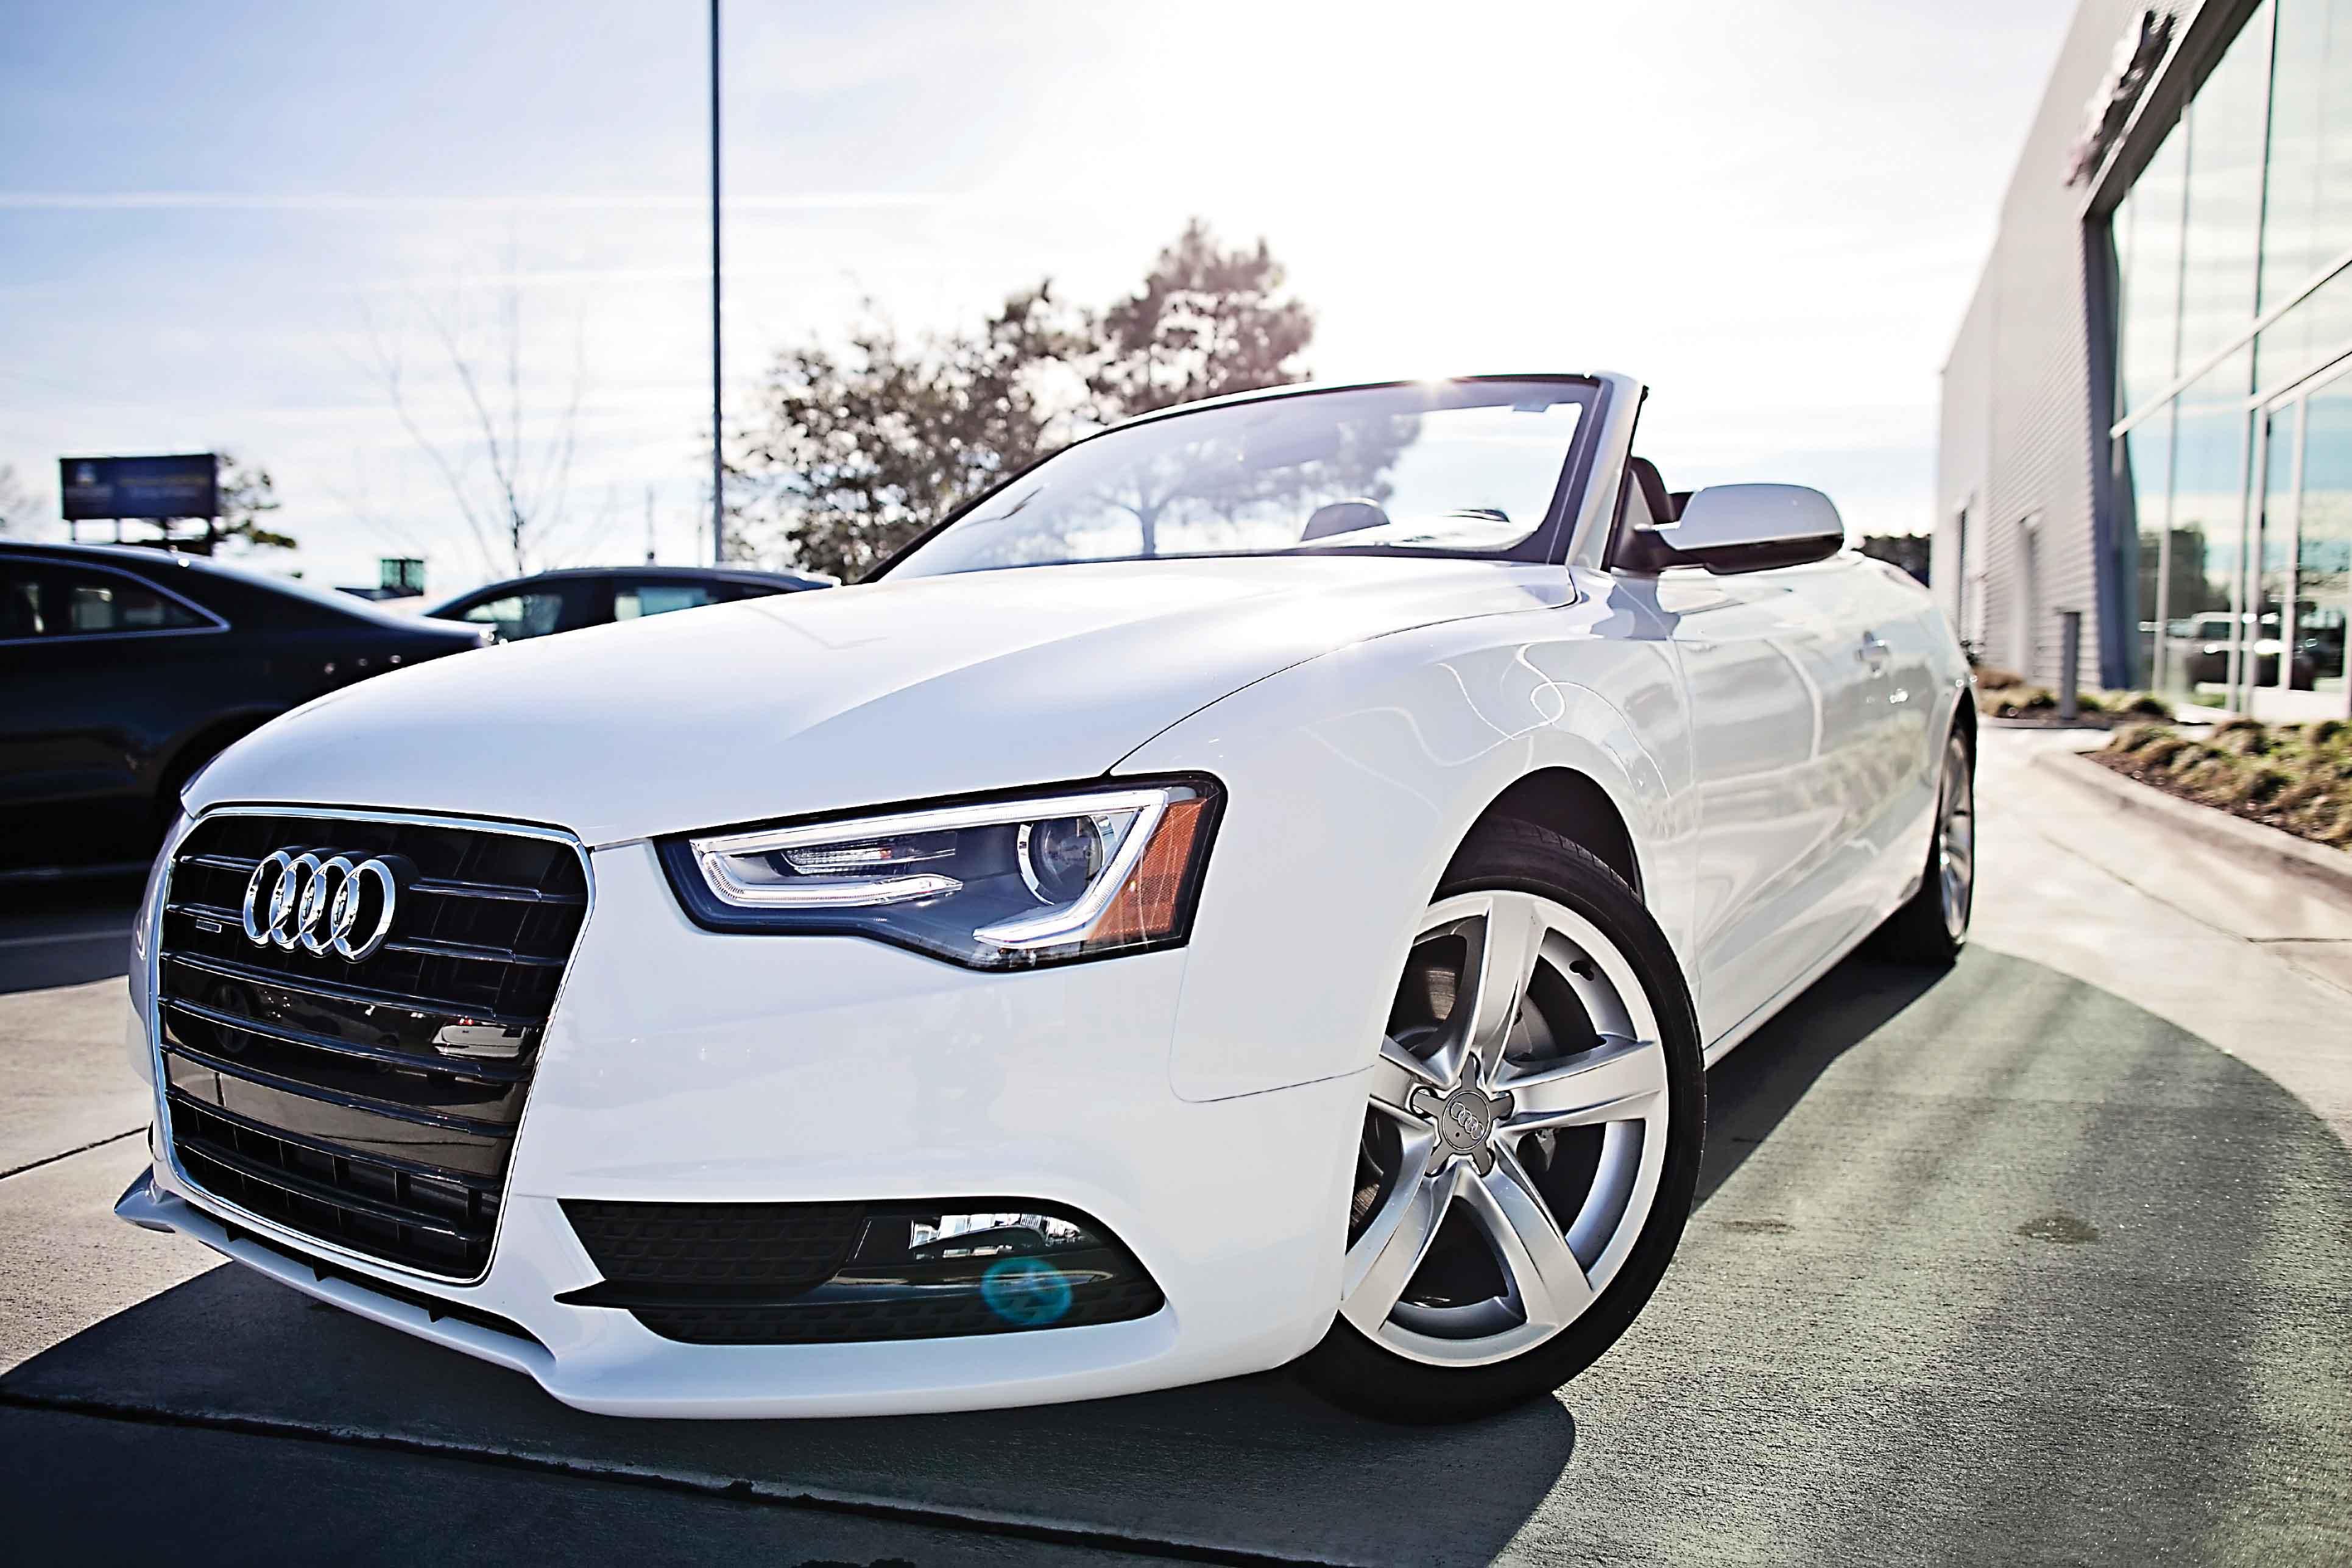 Wilmington Symphony to raffle off 2016 Audi convertible